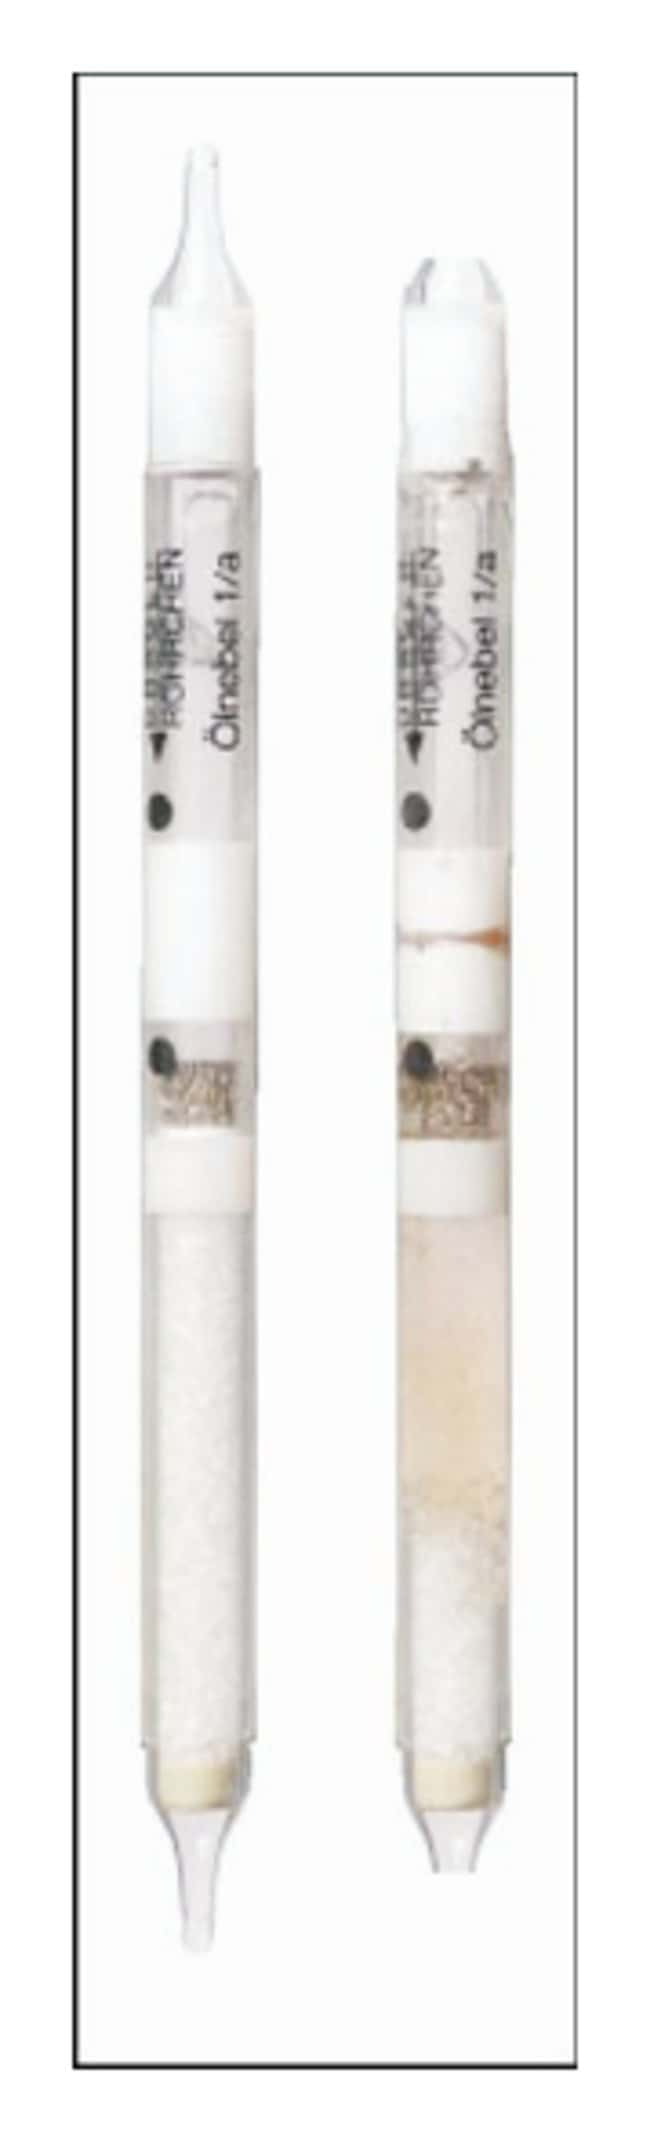 Dräger™Short-Term Detector Tubes: Oil Mist: Gas and Vapor Detection Chemical Monitoring Instrumentation